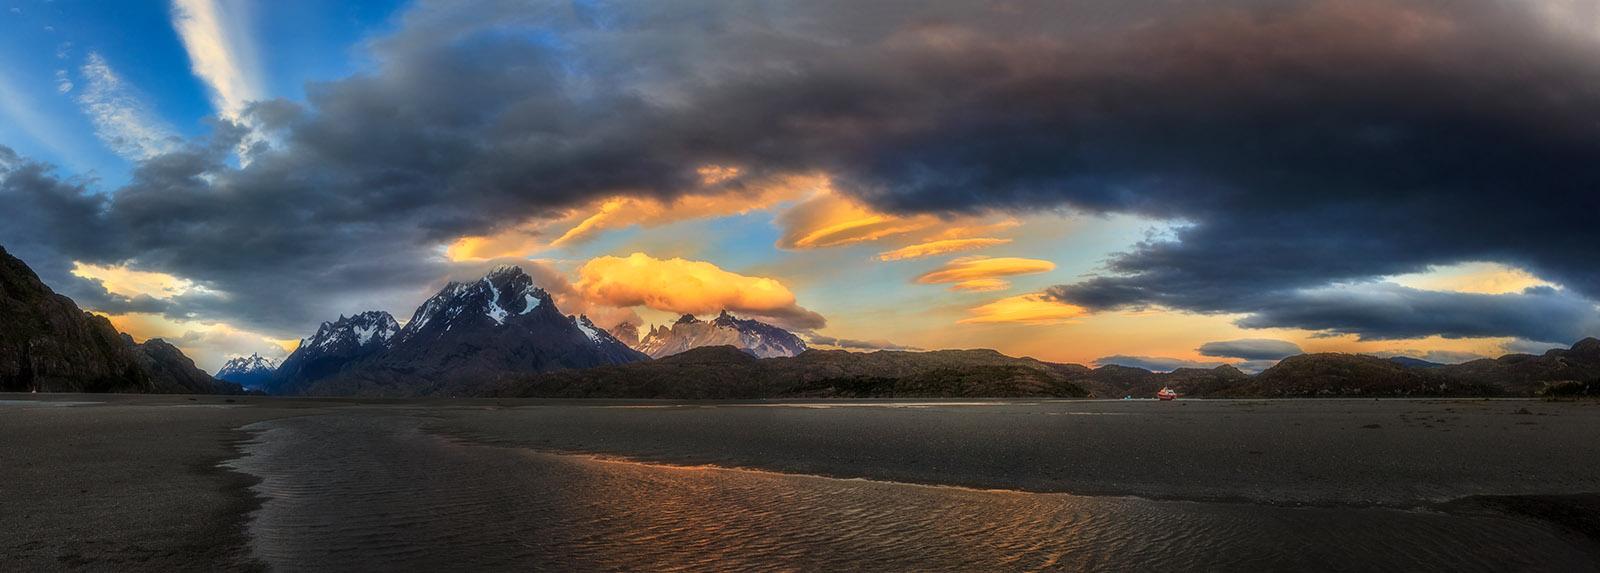 Landscape-Argentina-Ptagonia-LagoGrey-1098 Panorama-Orton-Web.jpg